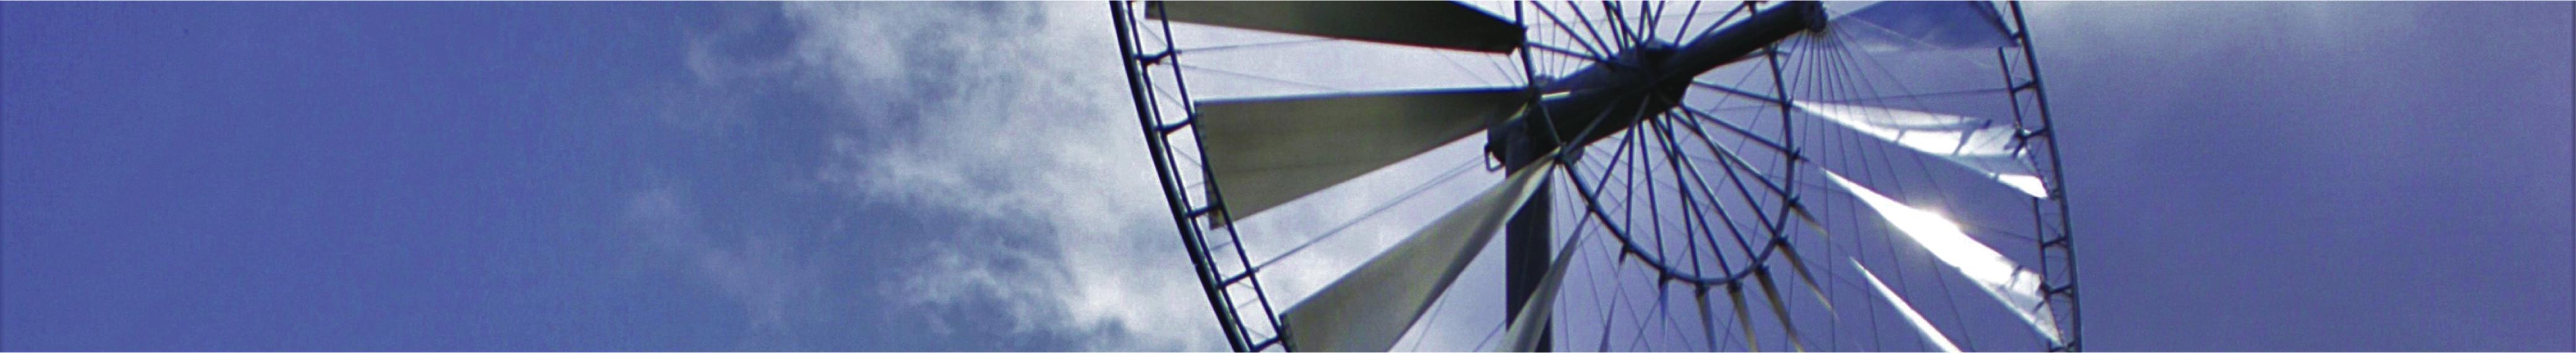 Renewable Energy Galvanizing Banner